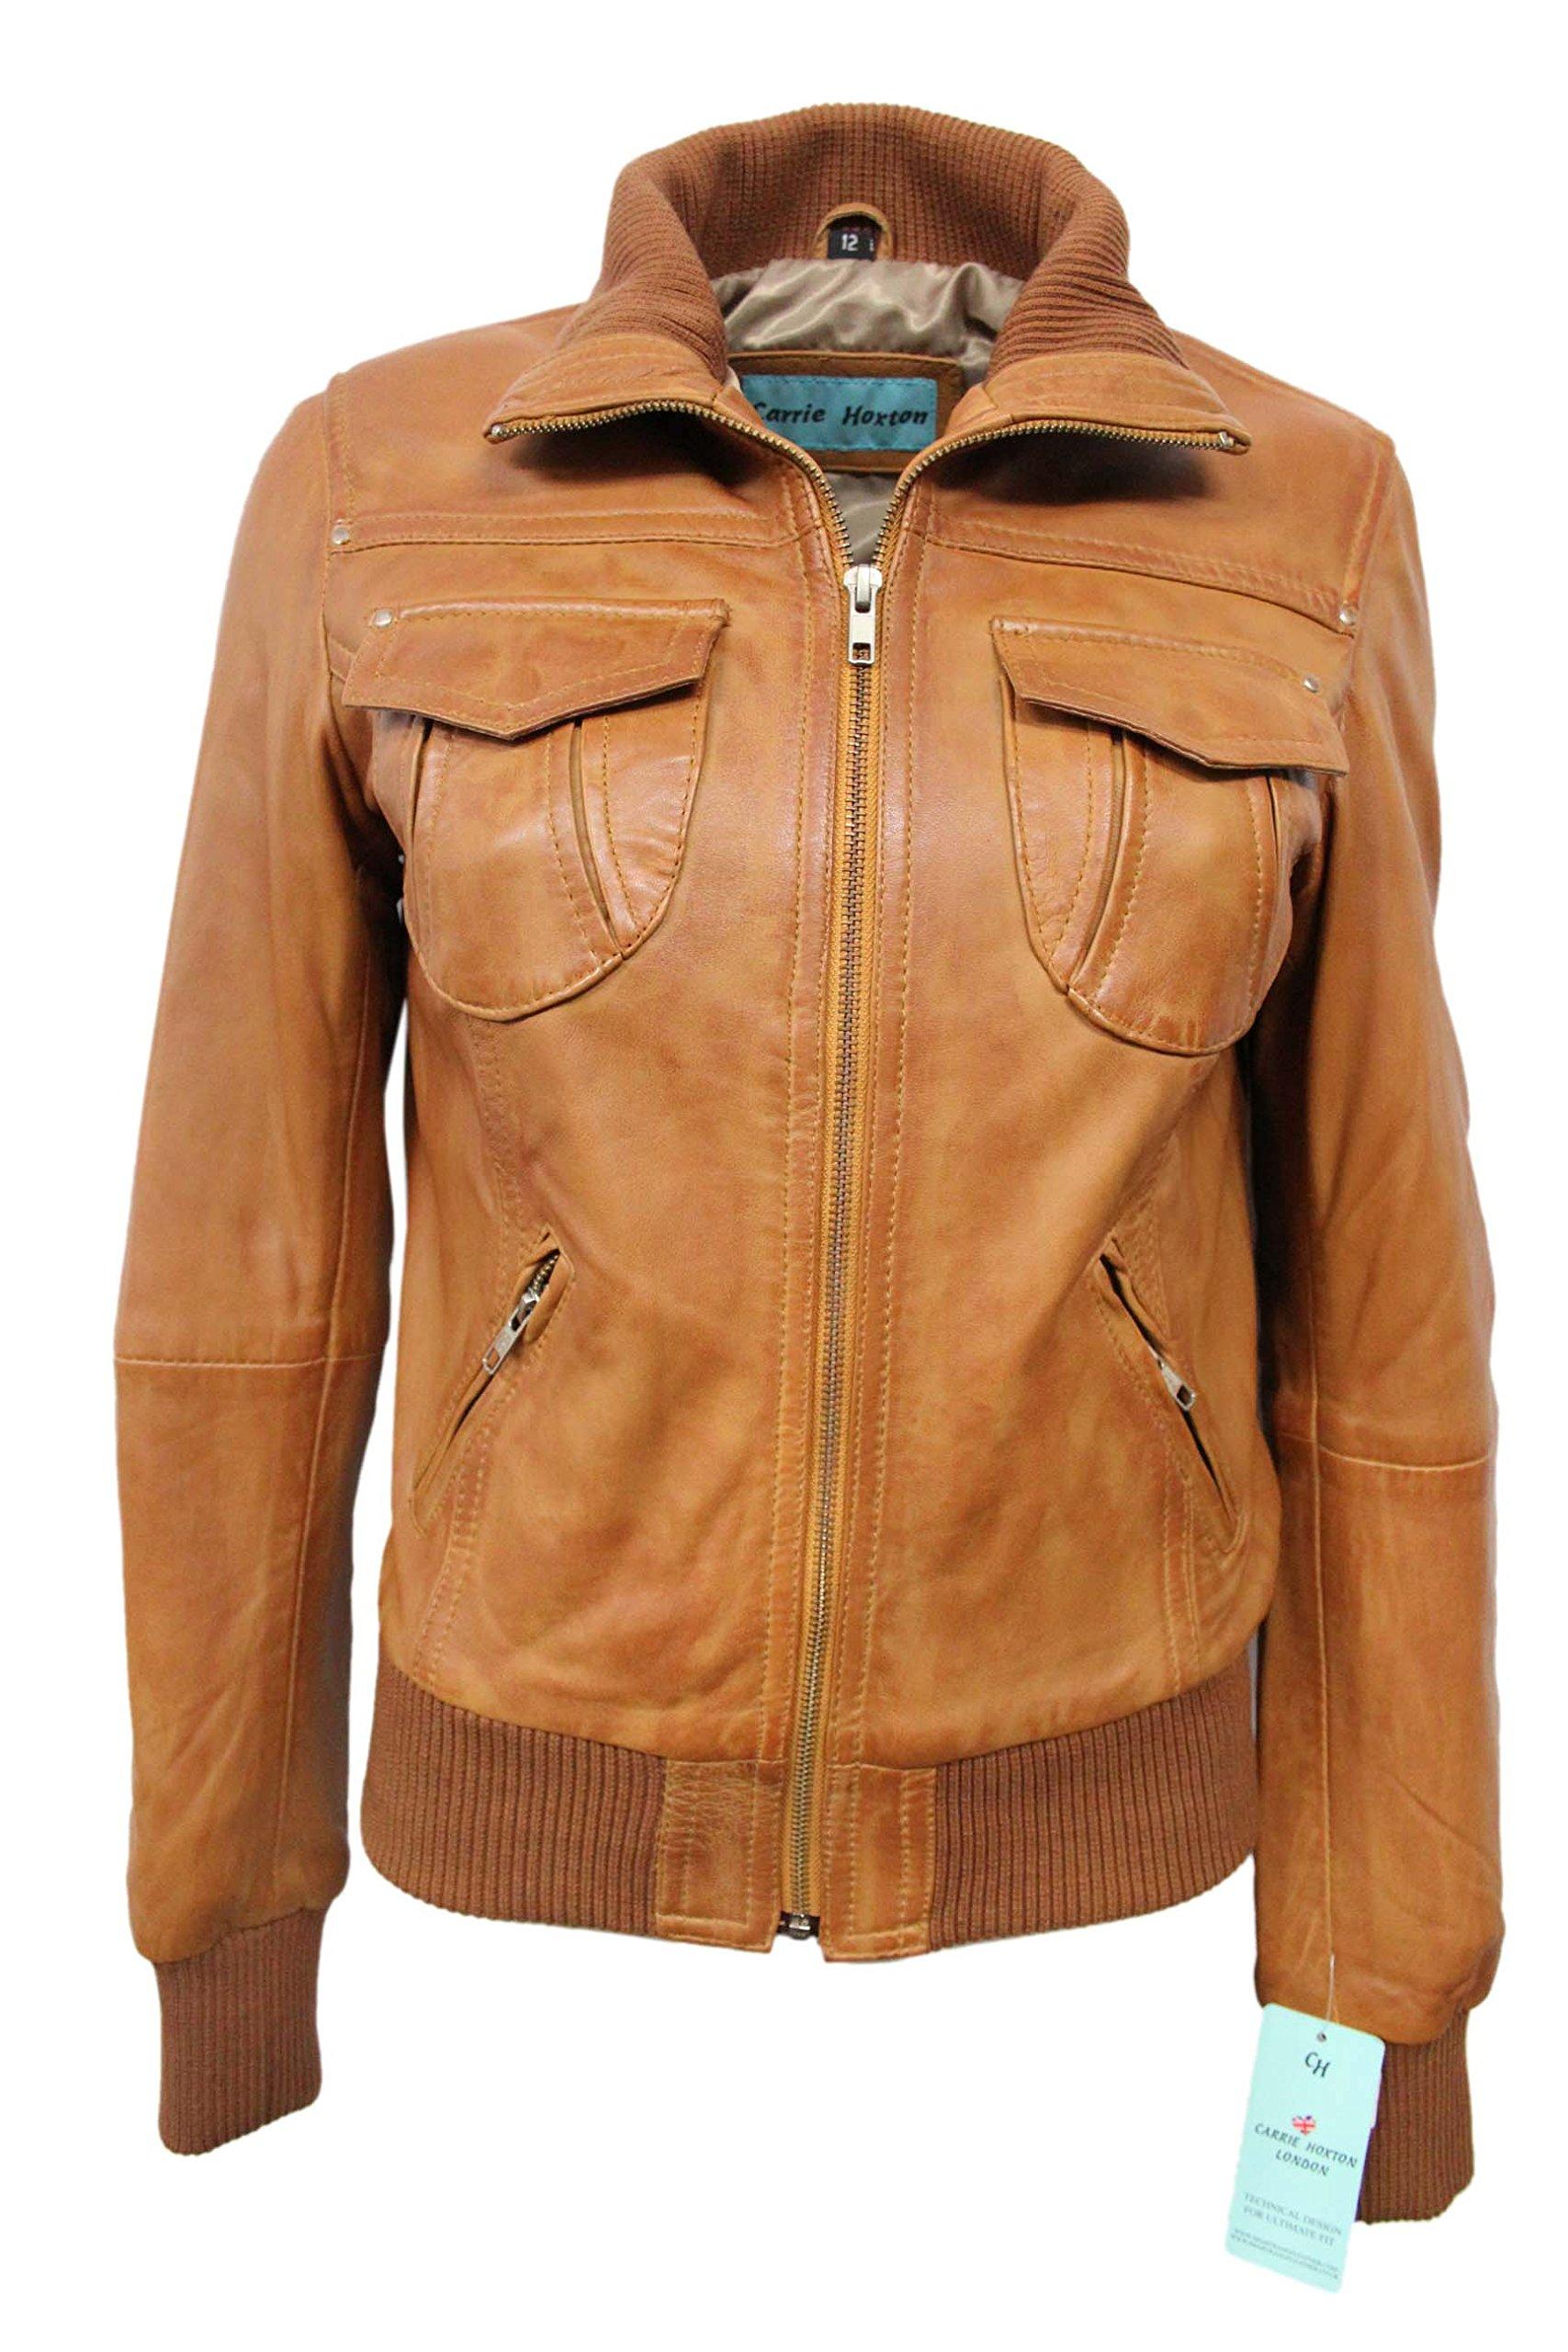 'Fusion' Ladies Tan Washed Short Bomber Biker Motorcycle Style Leather Jacket (UK 18/US 14, Tan)